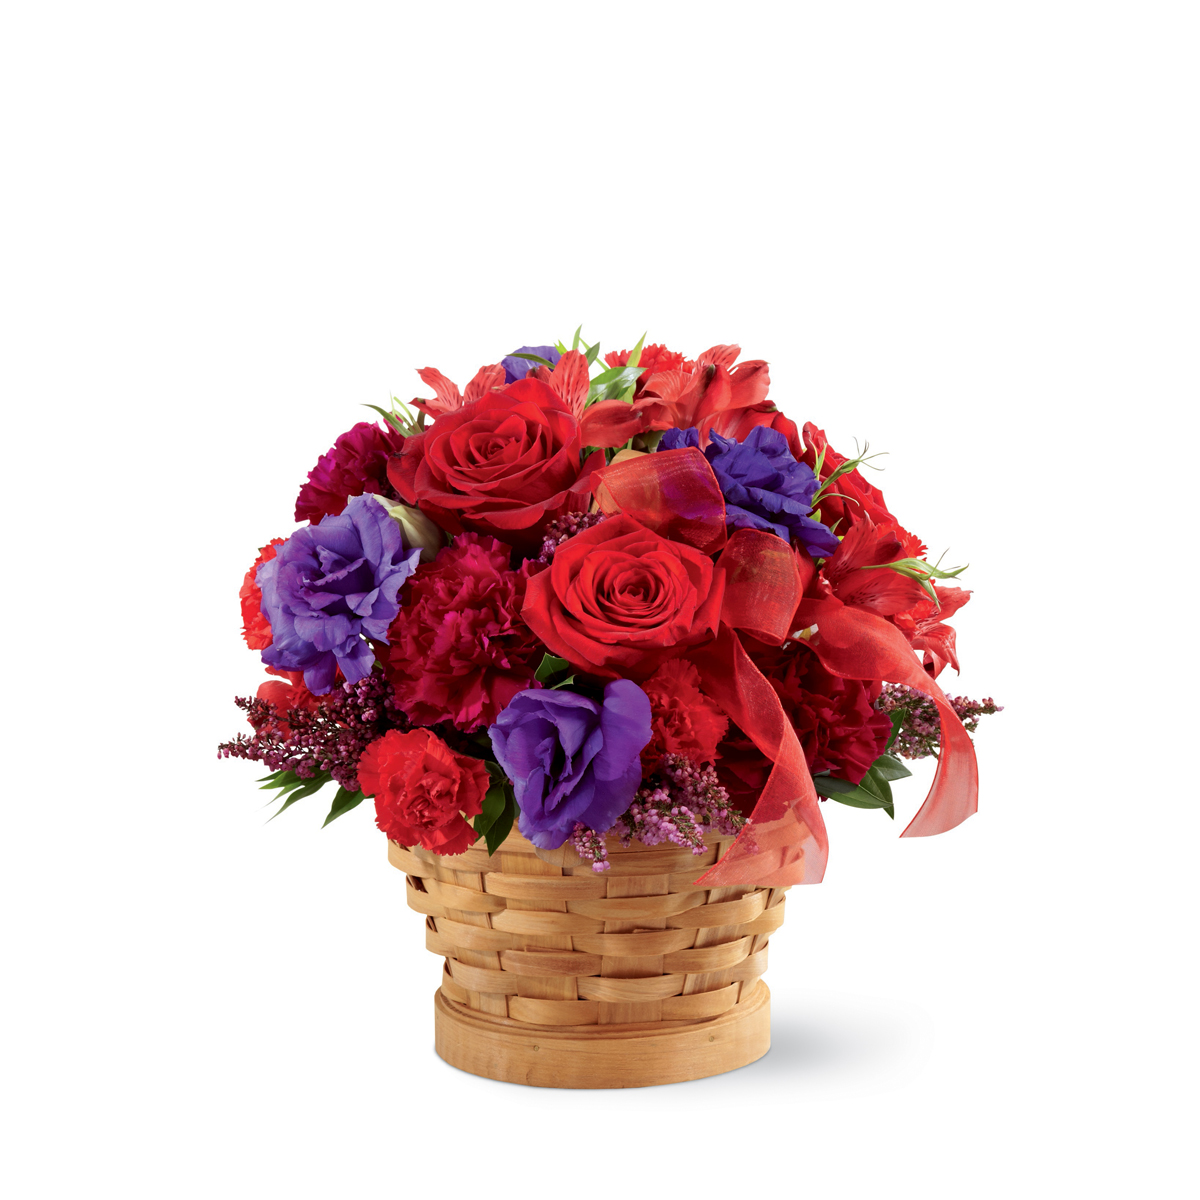 The Ftd White Rose Sympathy Bouquet Madisonville Ky Florist